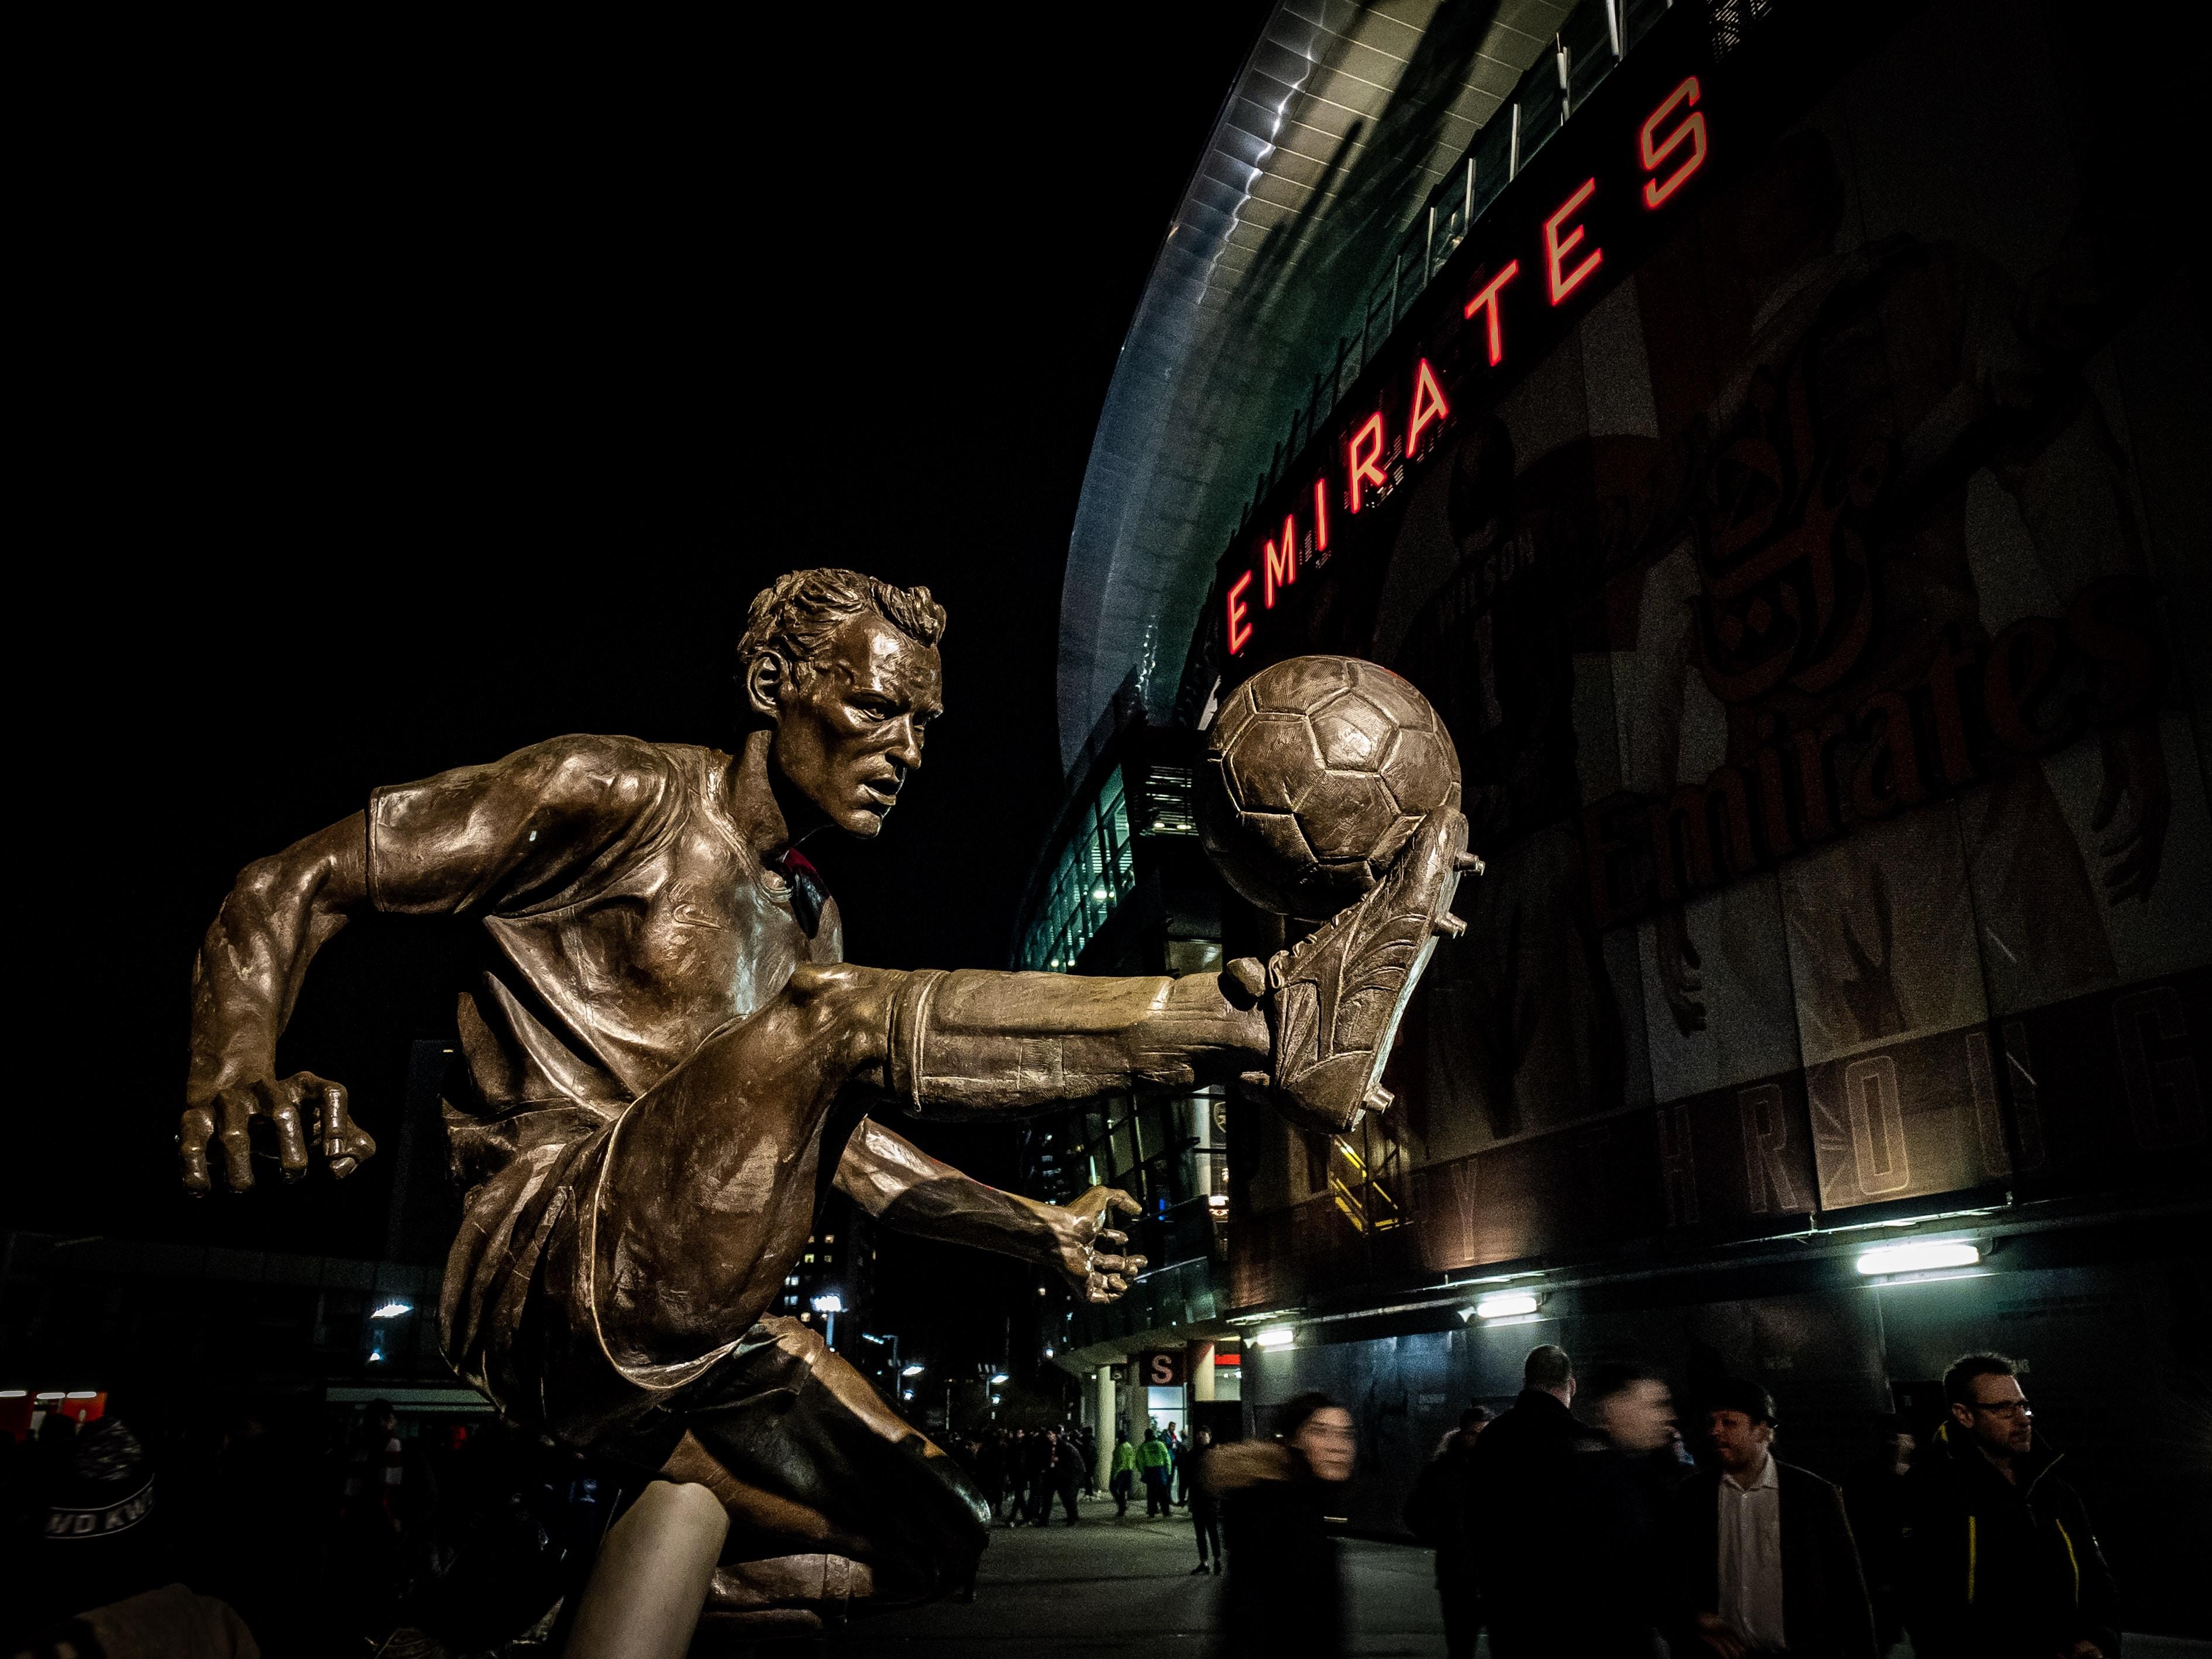 man playing soccer ball statue